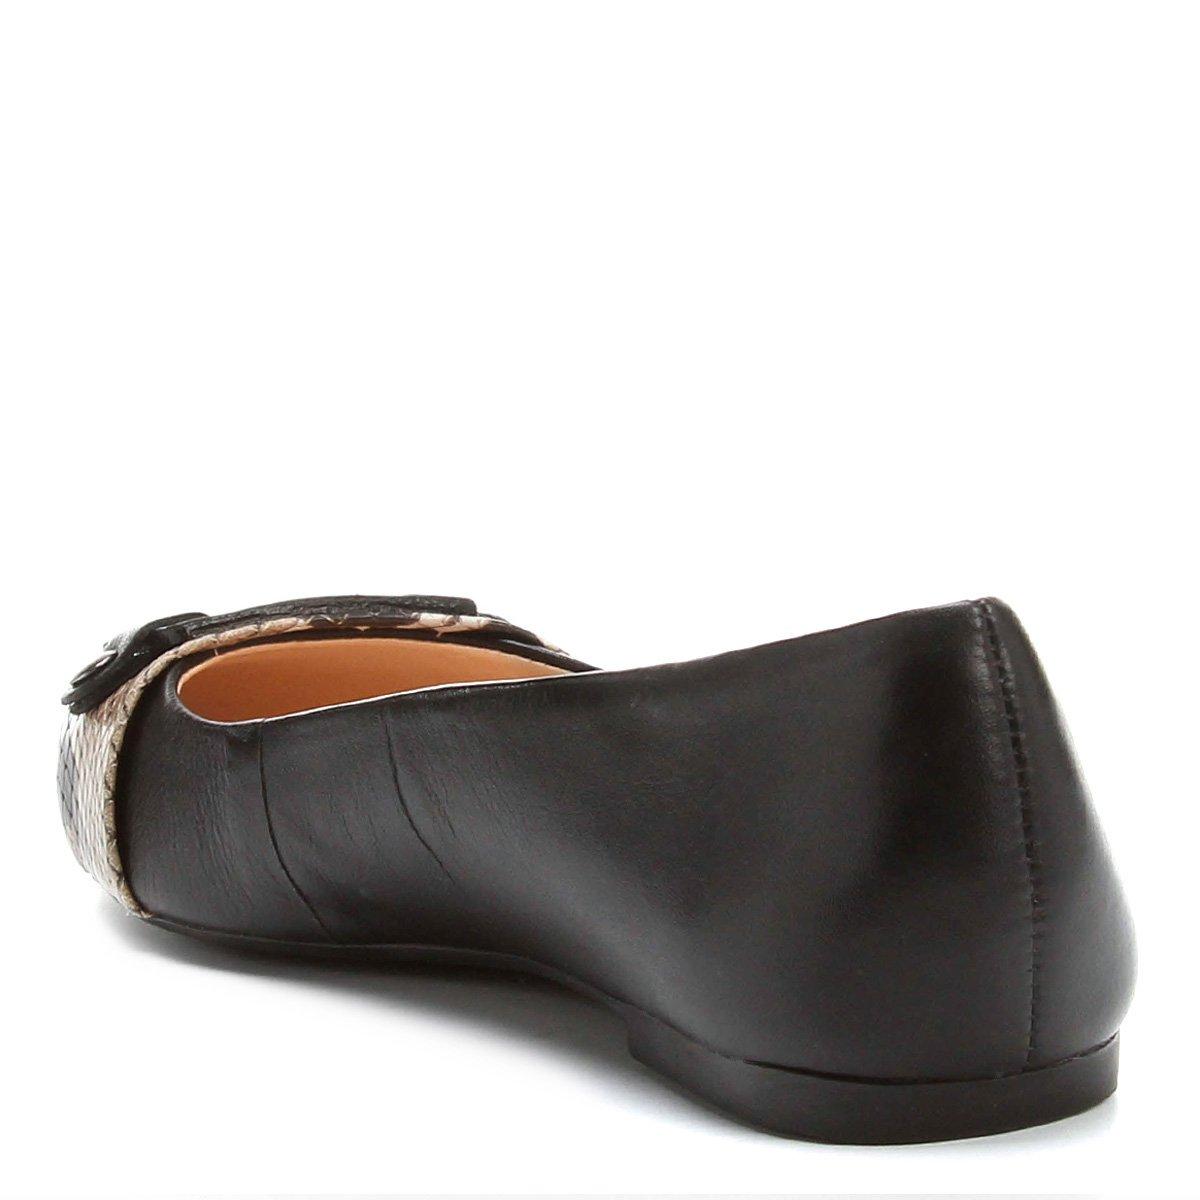 Sapatilha Sapatilha Fivela Preto Bico Feminina Fino Shoestock Couro Couro UUSqx4r